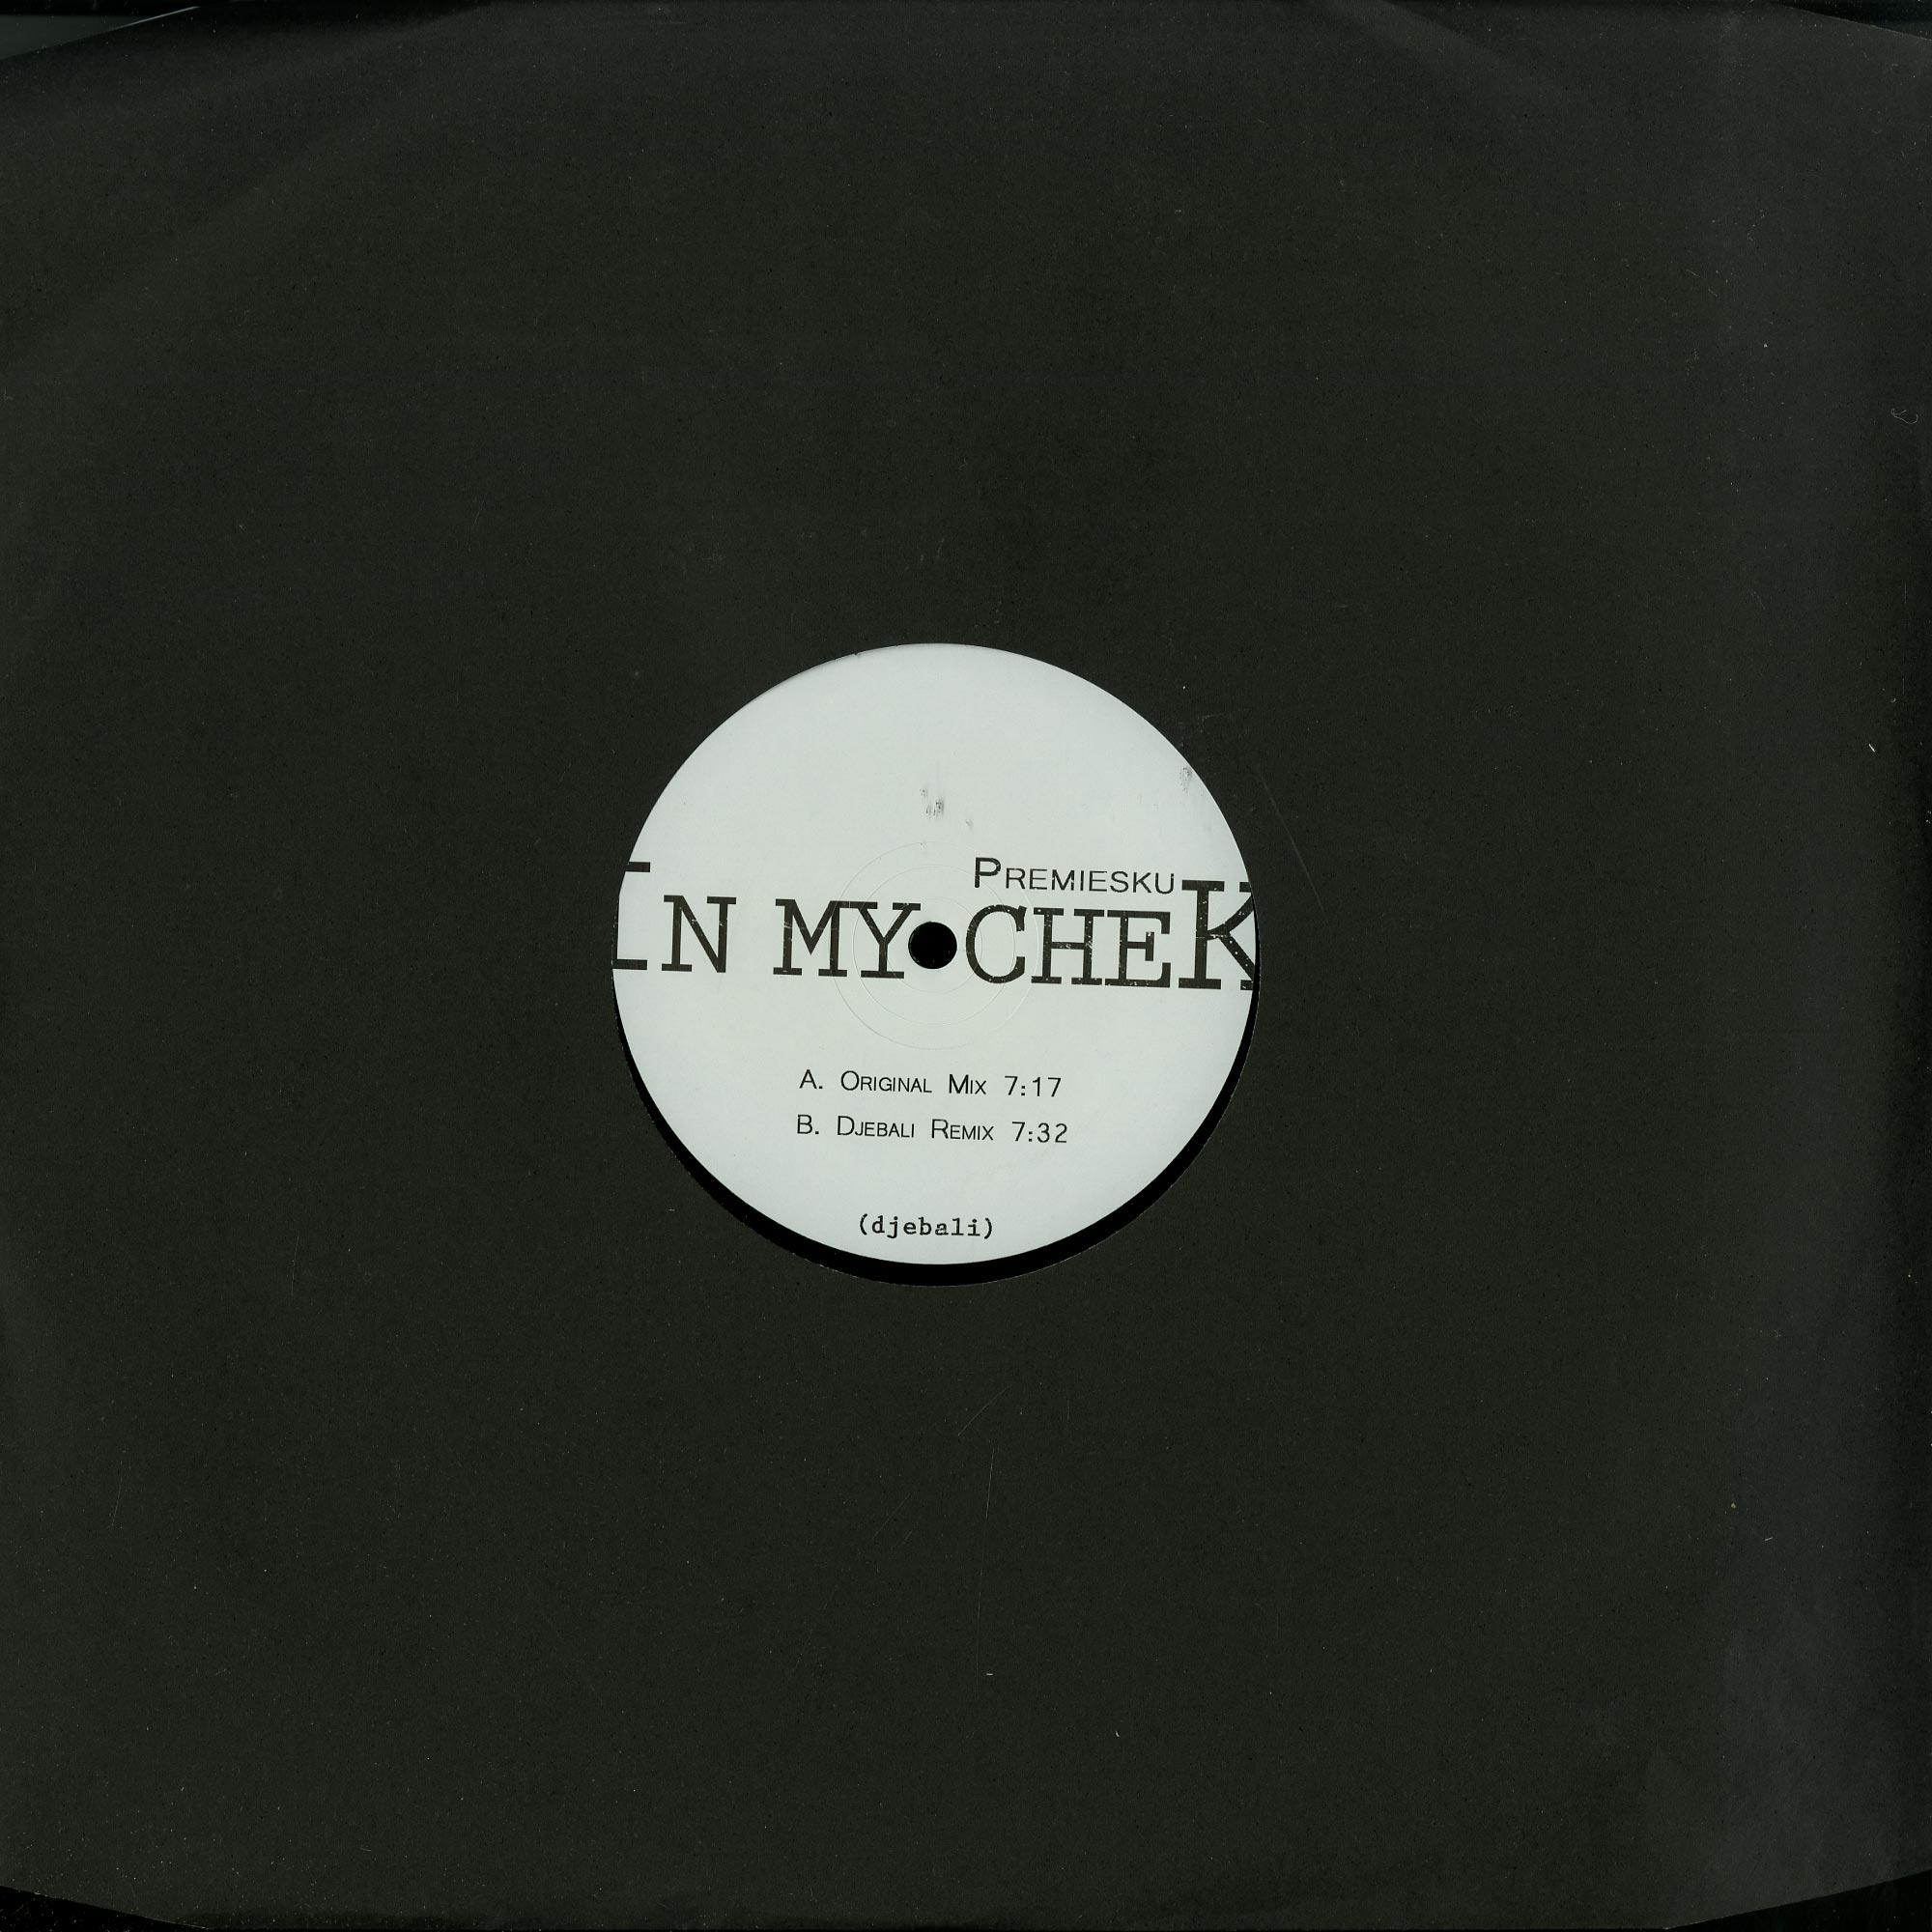 Premiesku - IN MY CHEK